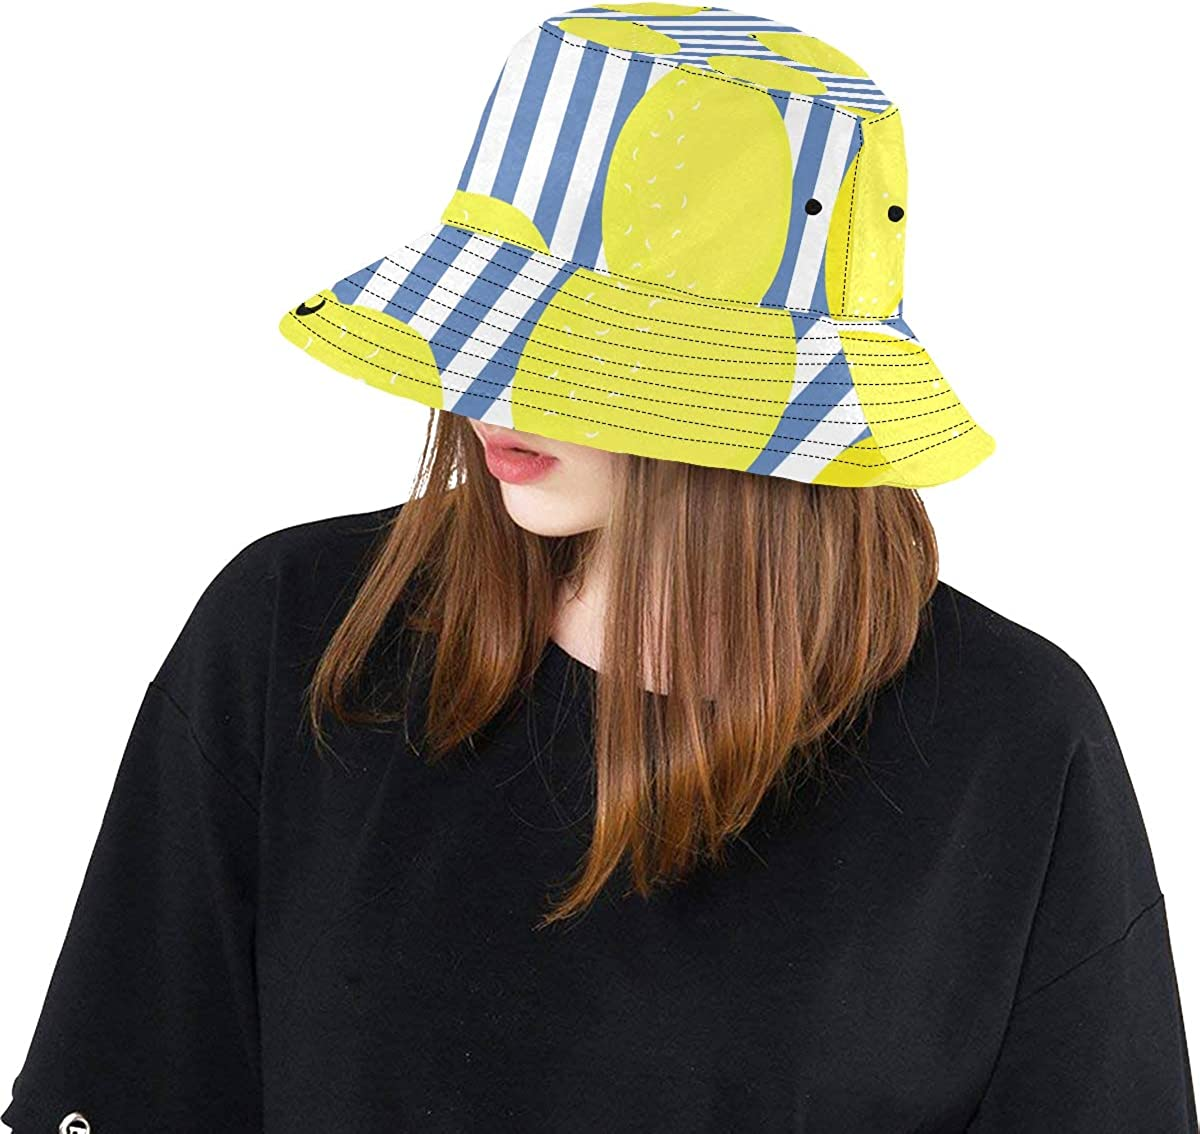 Strip Lemon Yellow Fruit Summer Unisex Fishing Sun Top Bucket Hats for Kid Teens Women and Men with Packable Fisherman Cap for Outdoor Baseball Sport Picnic